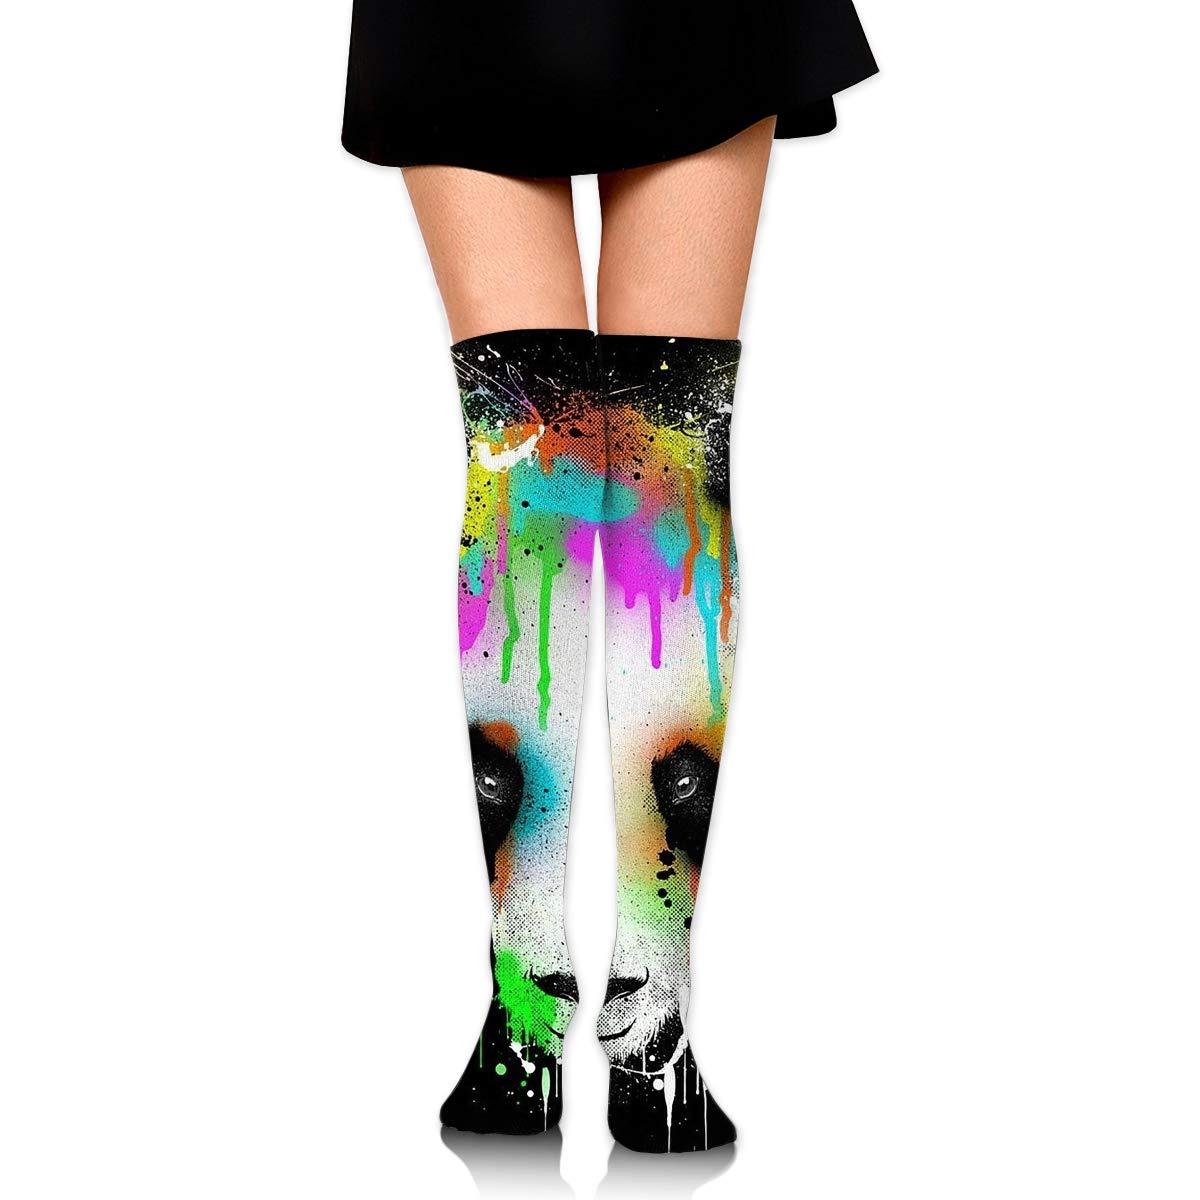 High Elasticity Girl Cotton Knee High Socks Uniform Painting Panda Women Tube Socks